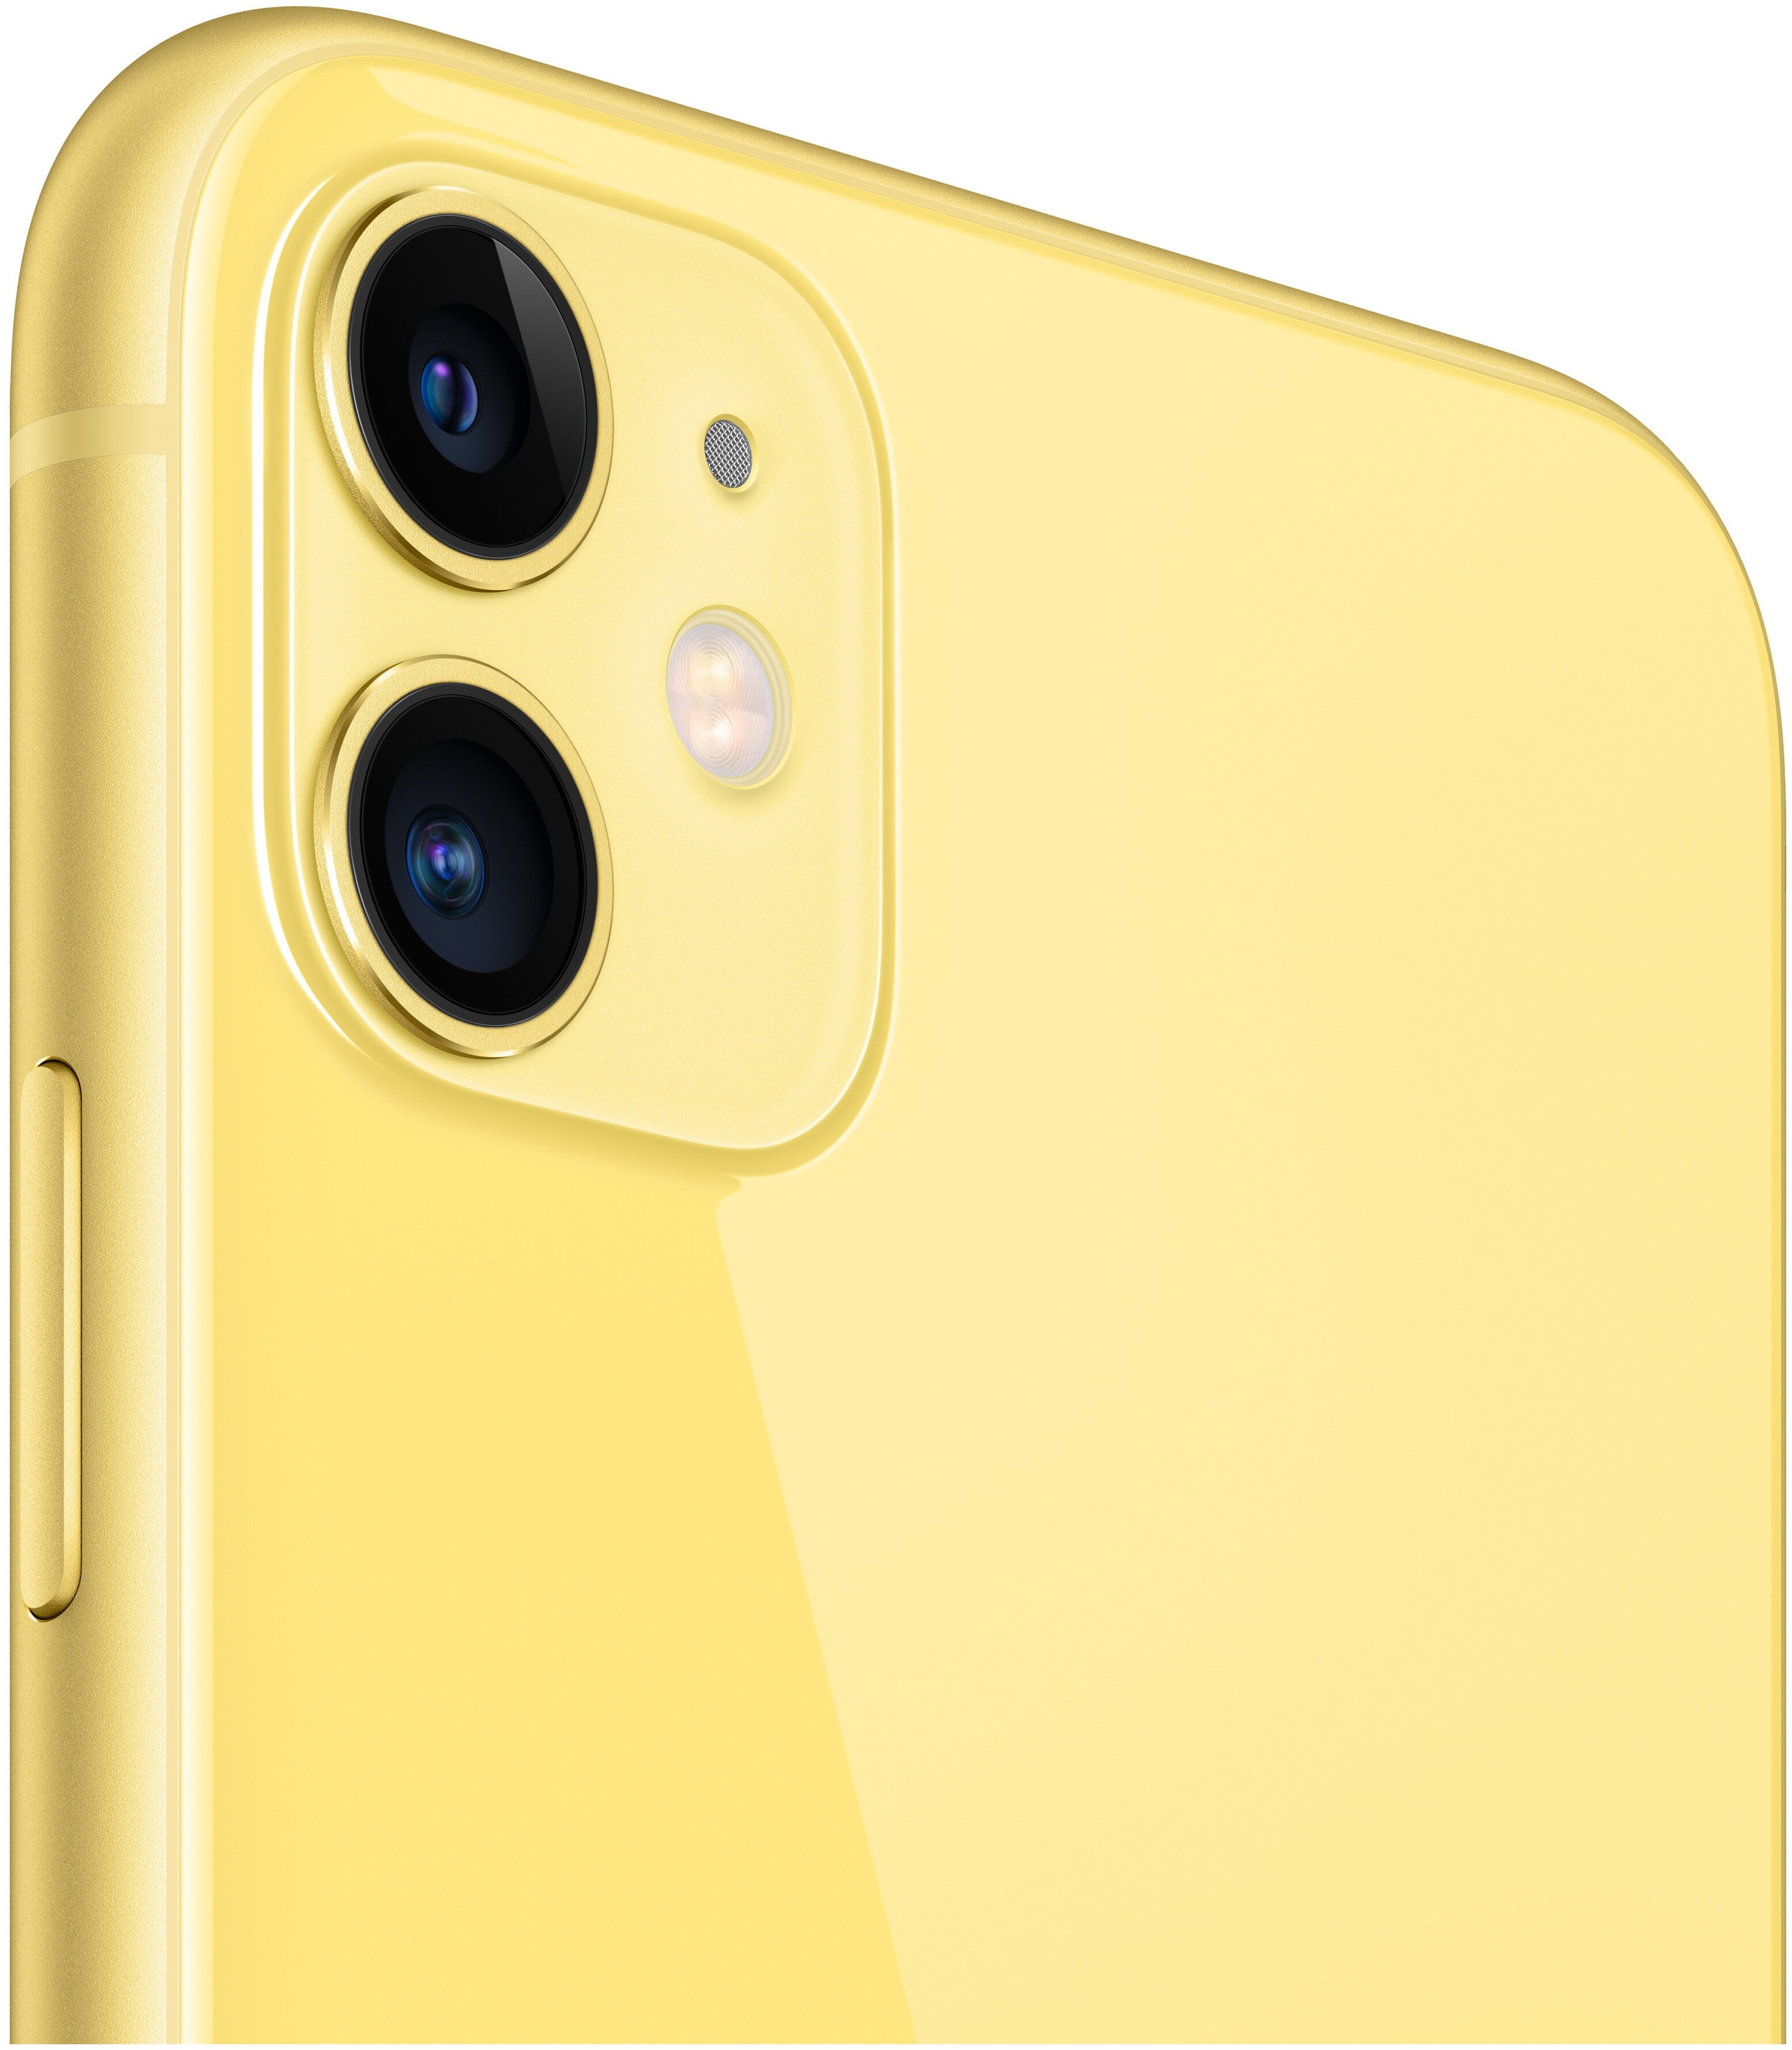 Apple iPhone 11 256GB - операционная система: iOS 13